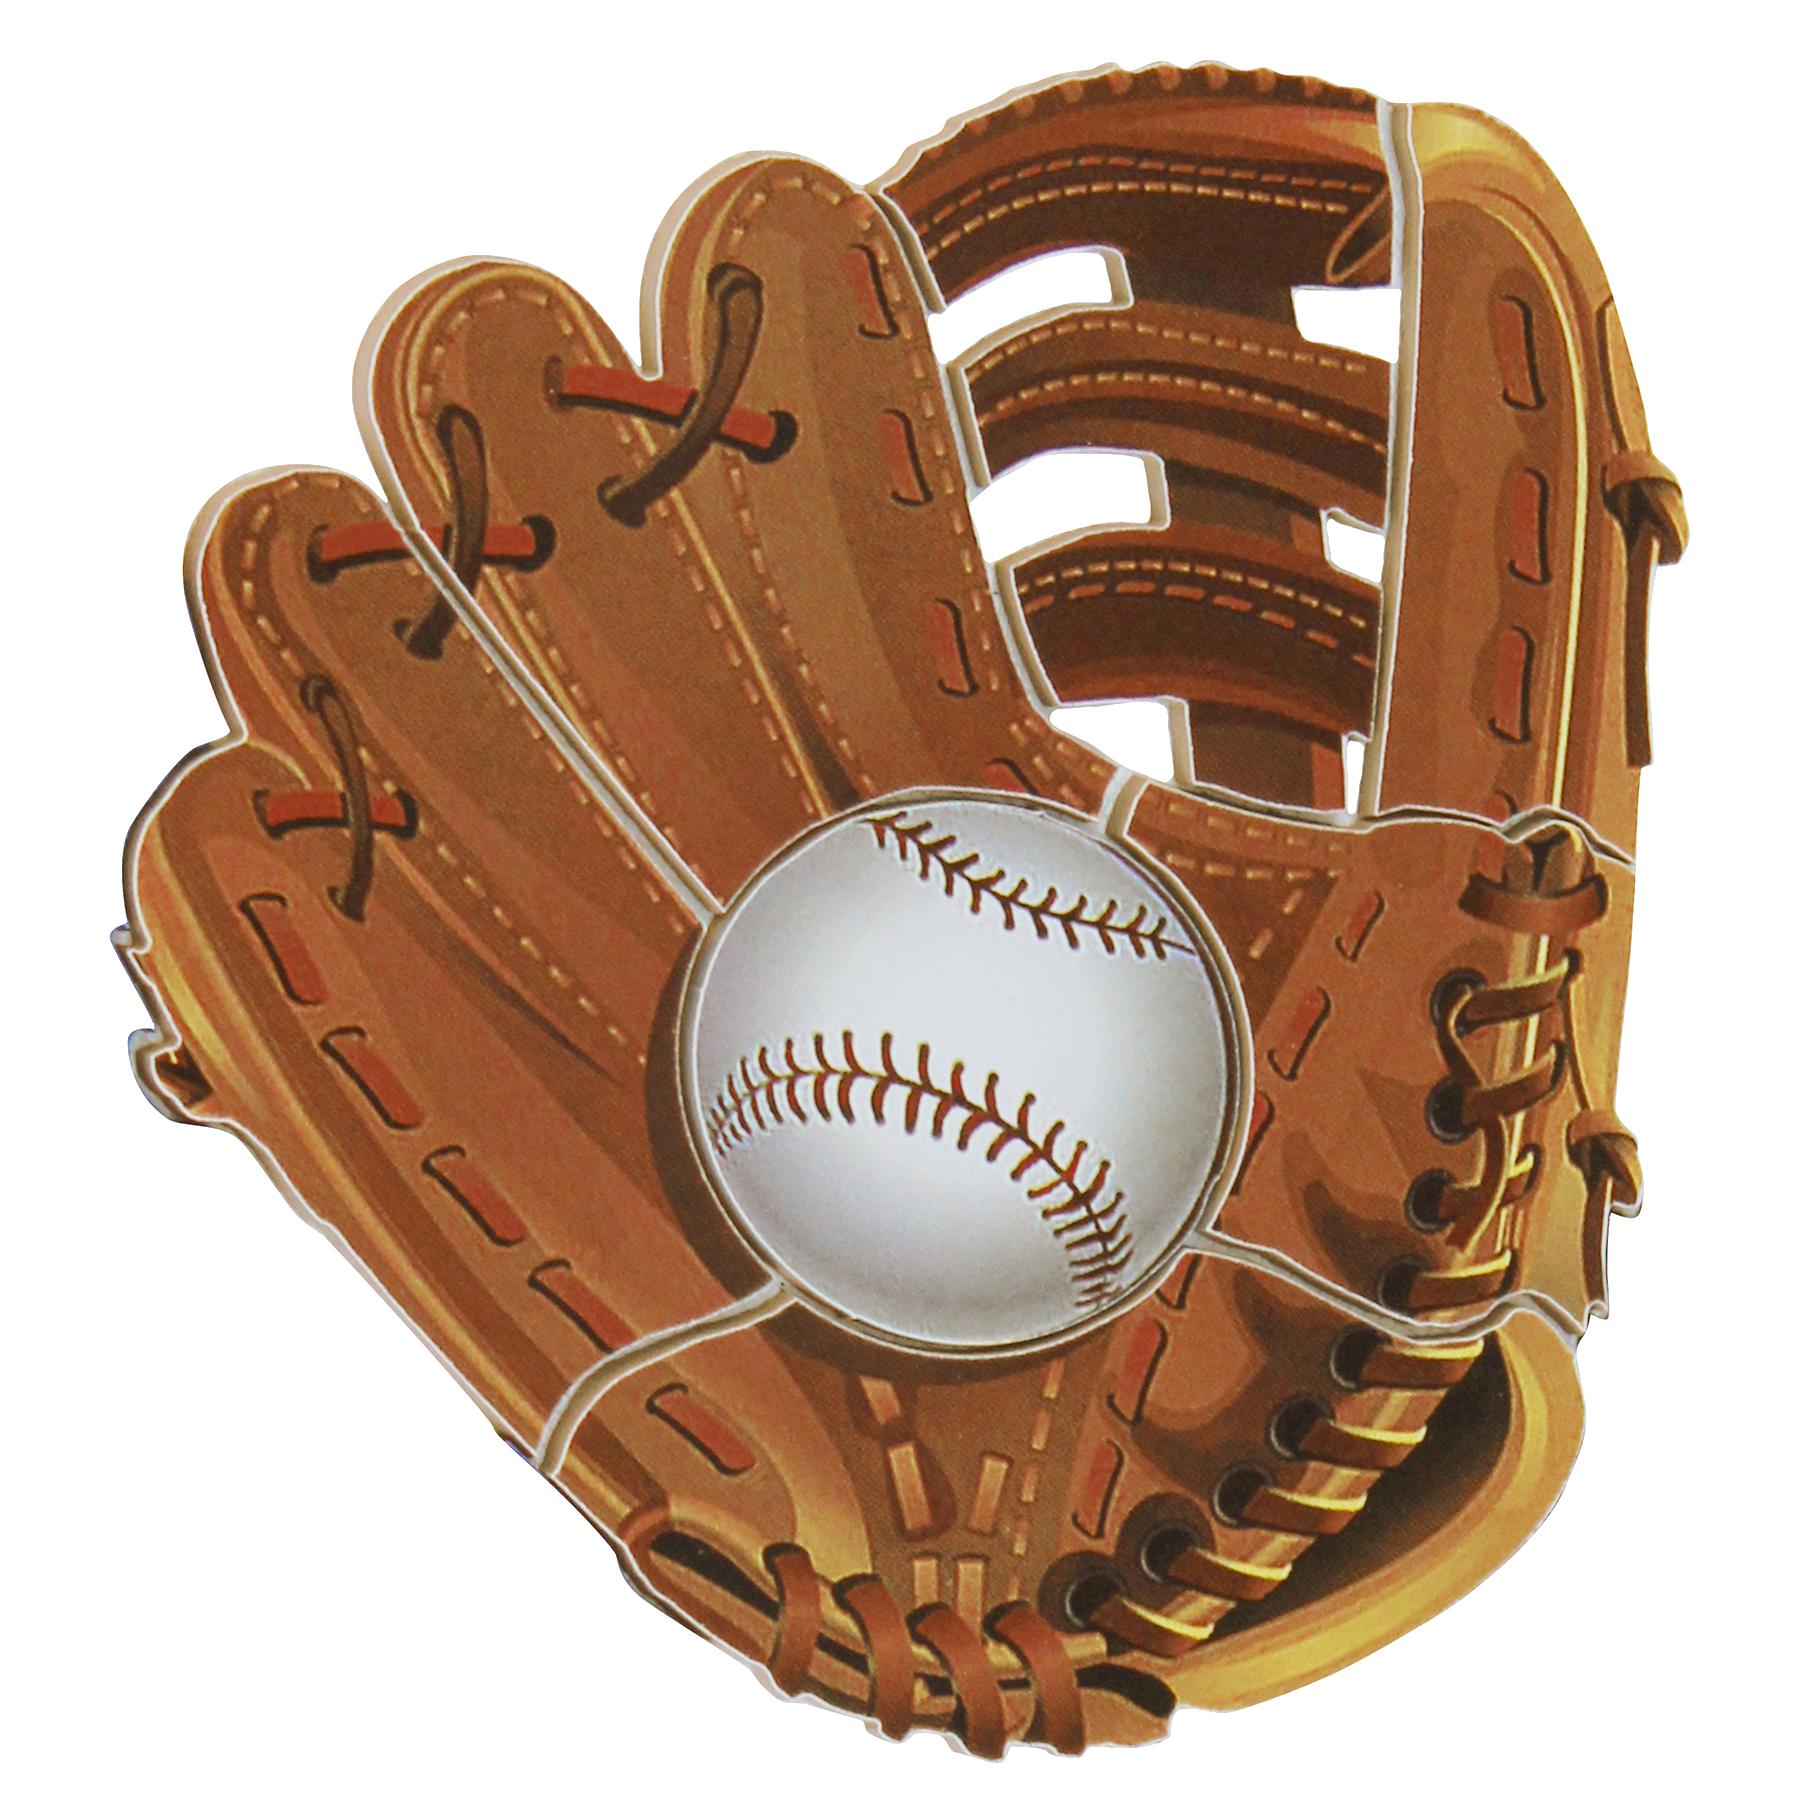 Baseball Glove2.png